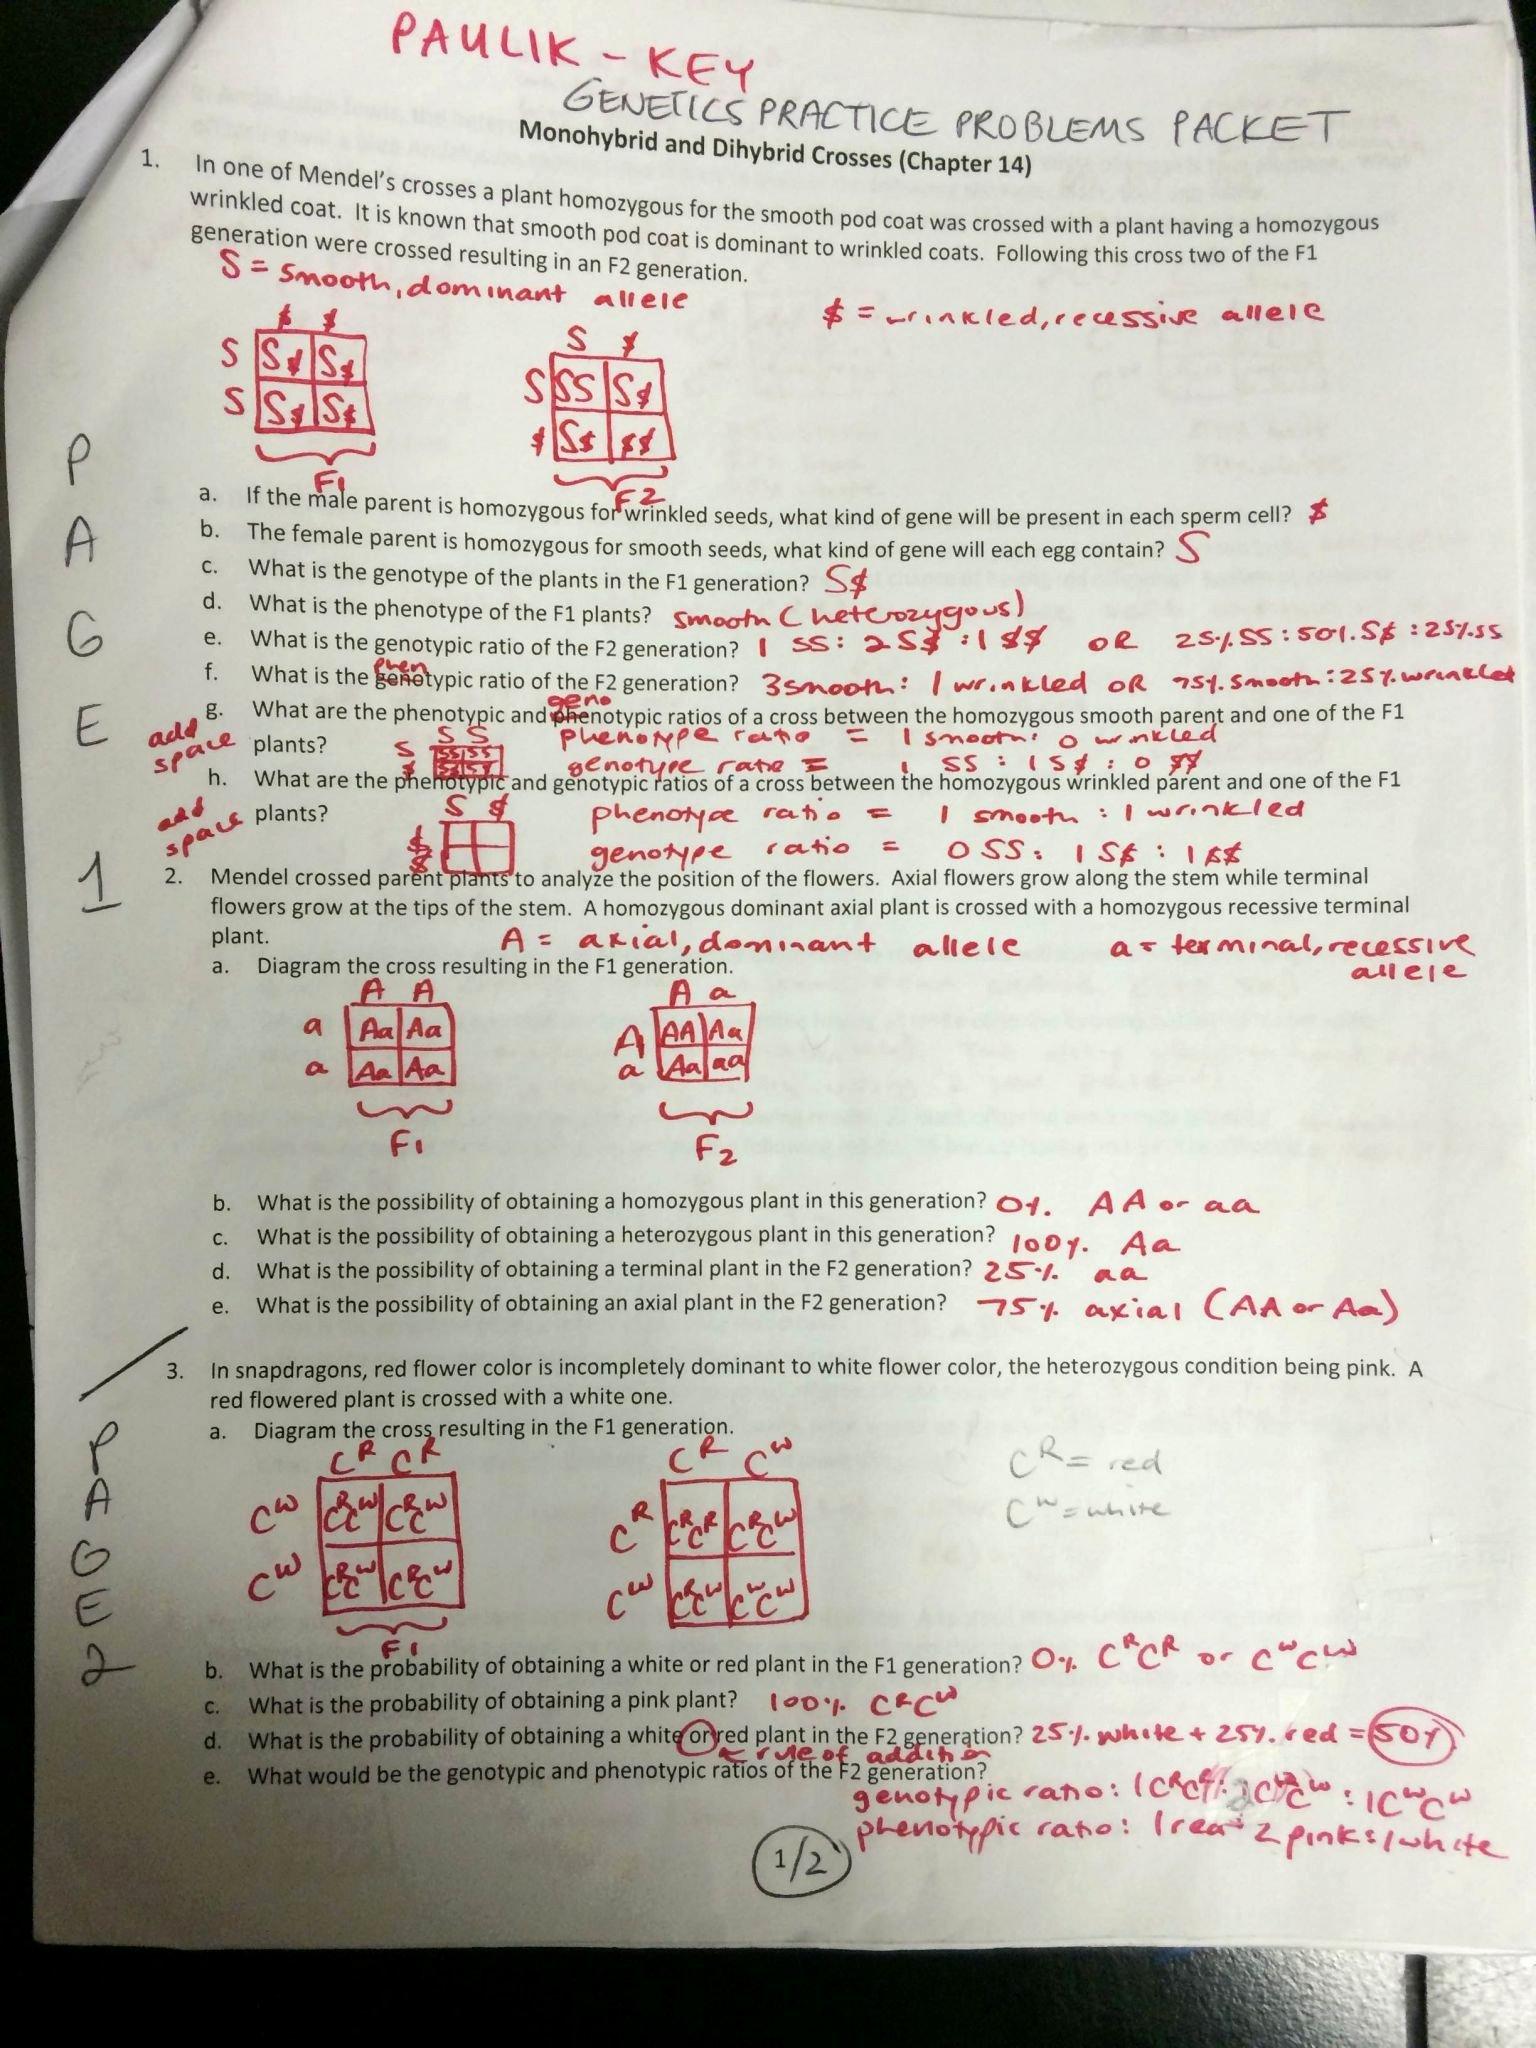 50 Genetics Problems Worksheet Answers